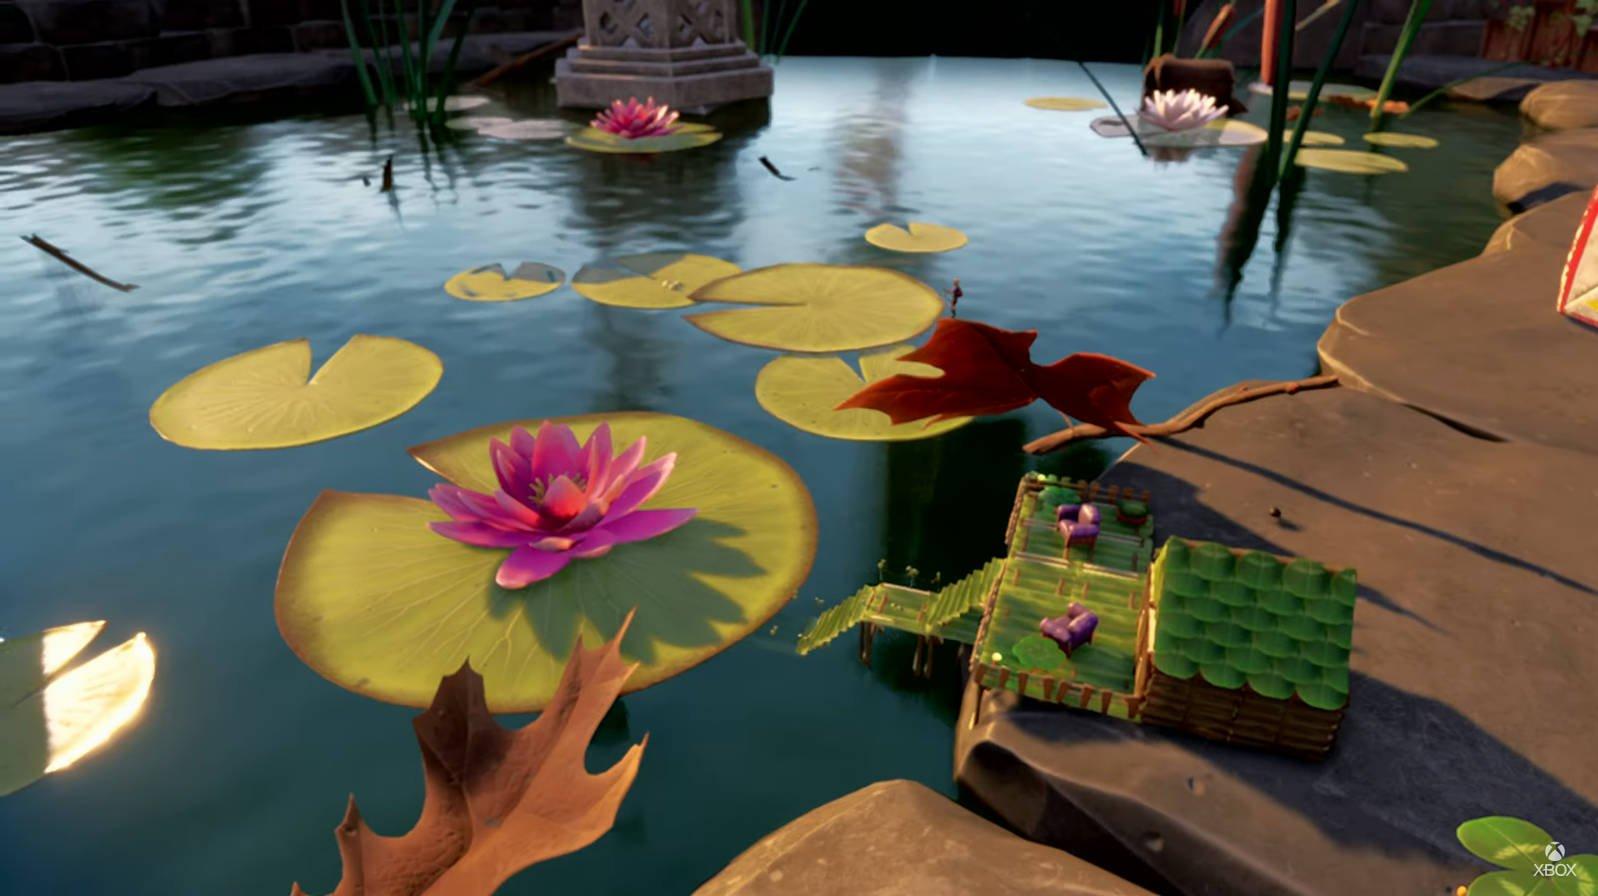 the koi pond at daytime